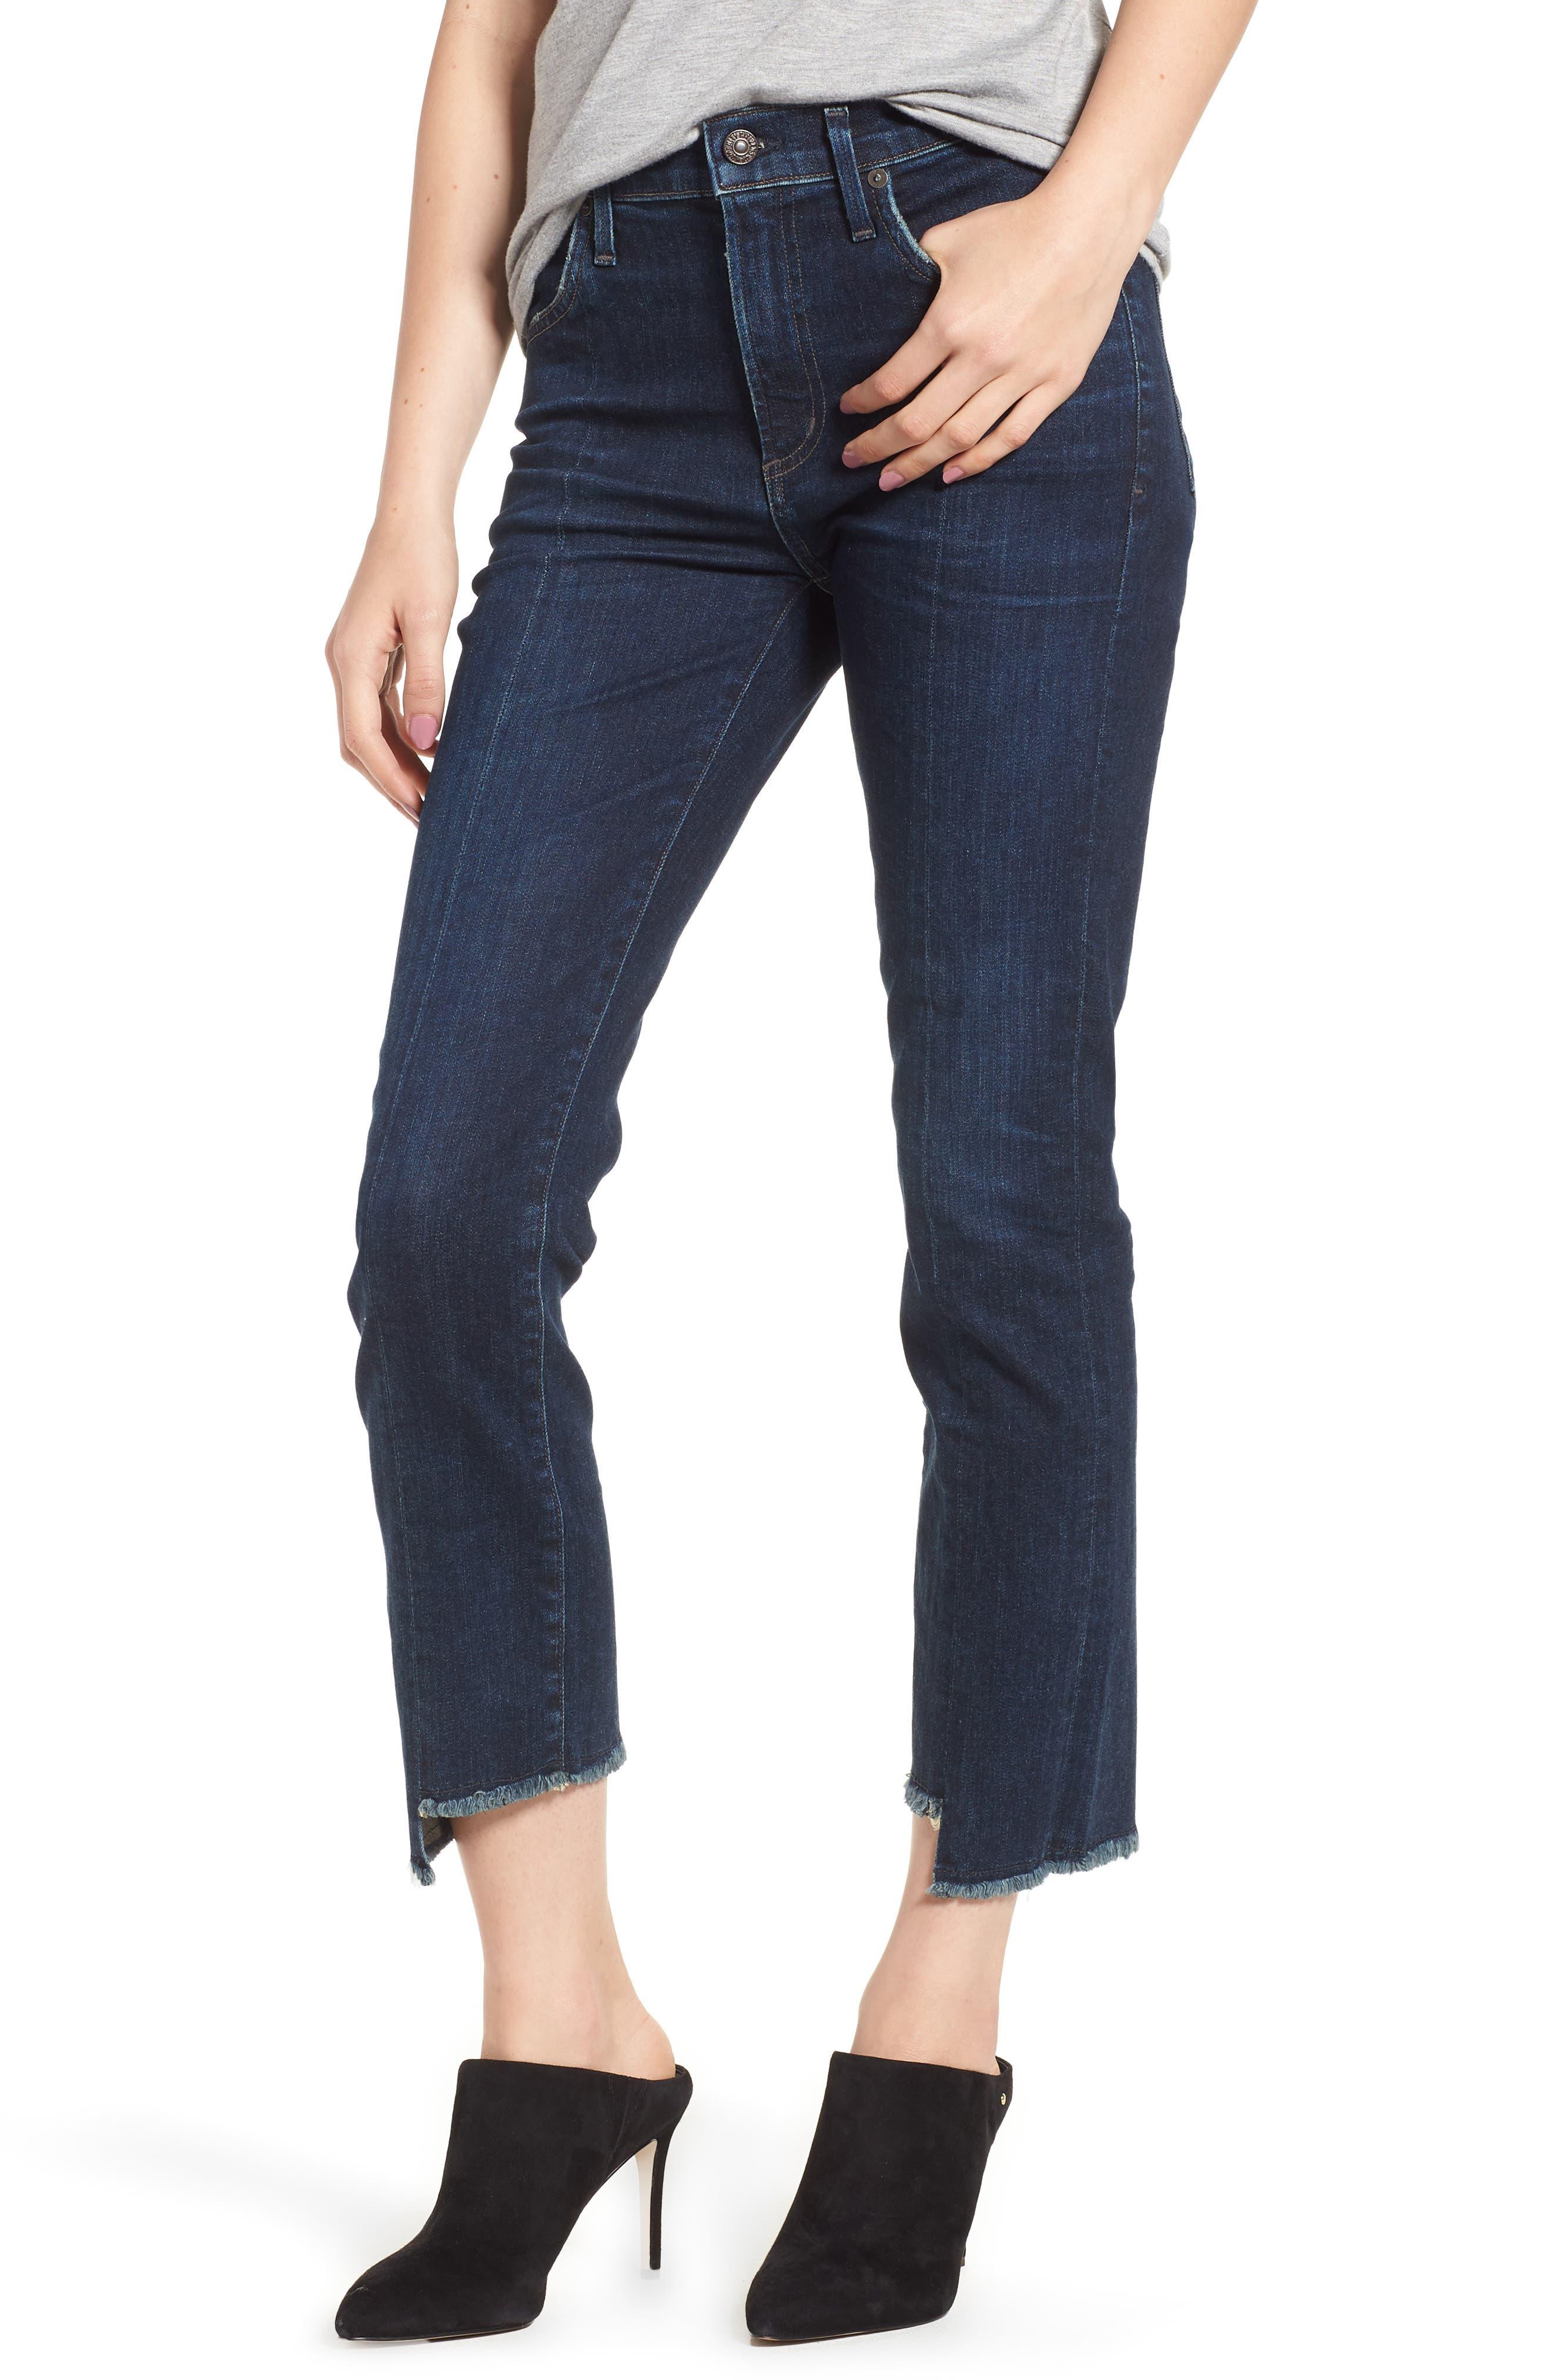 Amari Ankle Skinny Jeans,                         Main,                         color, 401